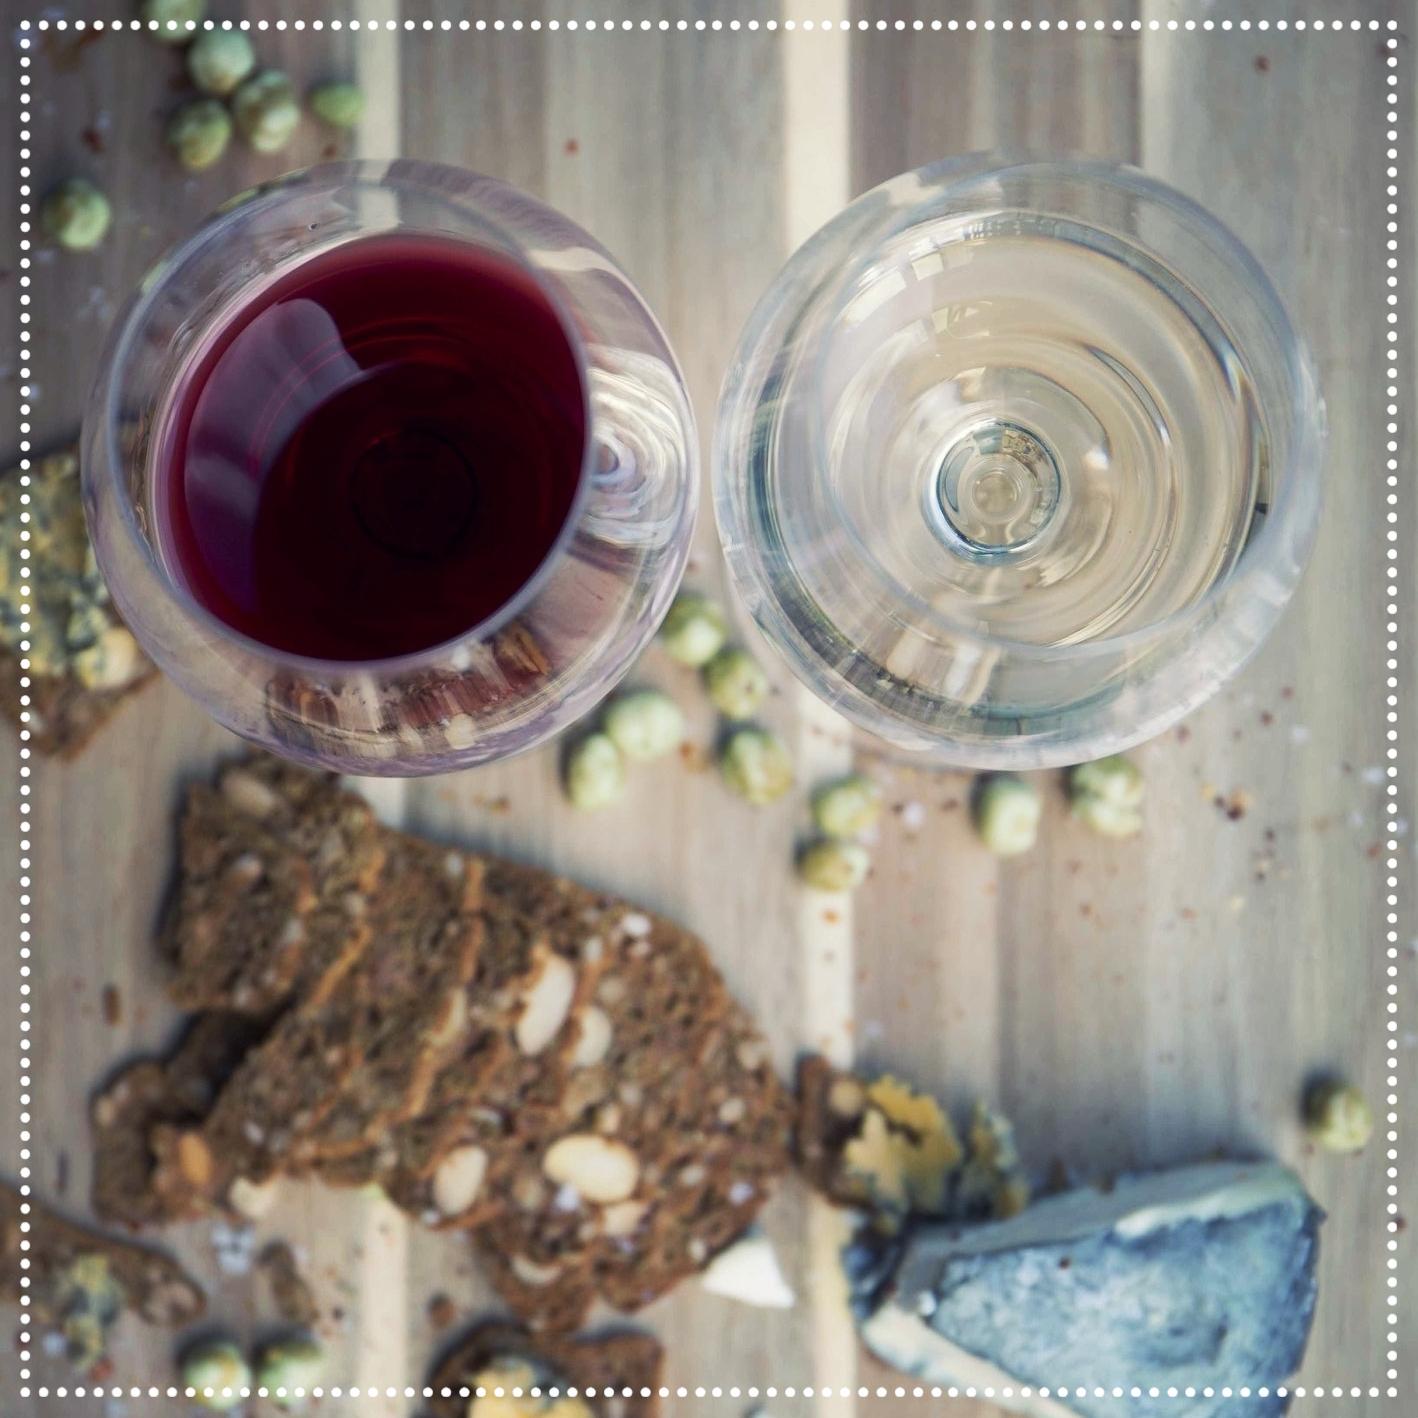 Heather's-Table-Wine-Experiences-Courses-Dublin